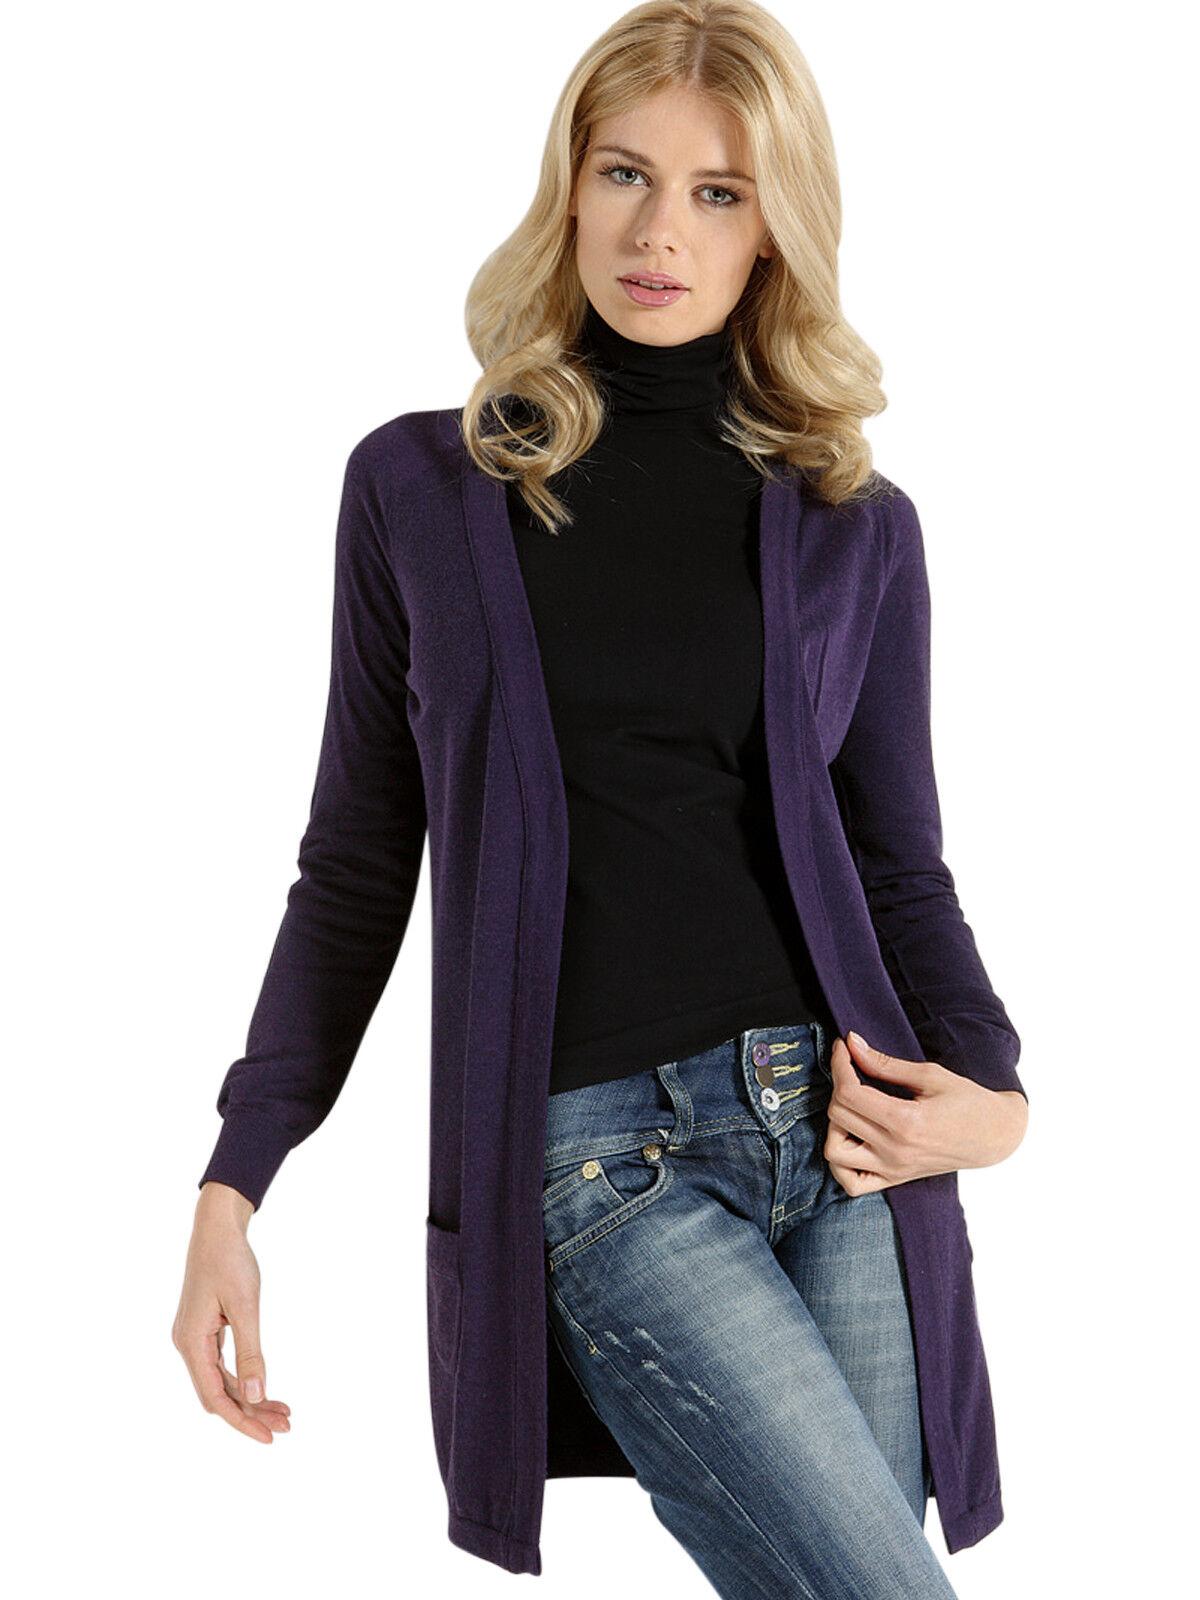 Cardigan women in lana Maglia manica lunga Fashion Sensì Made in